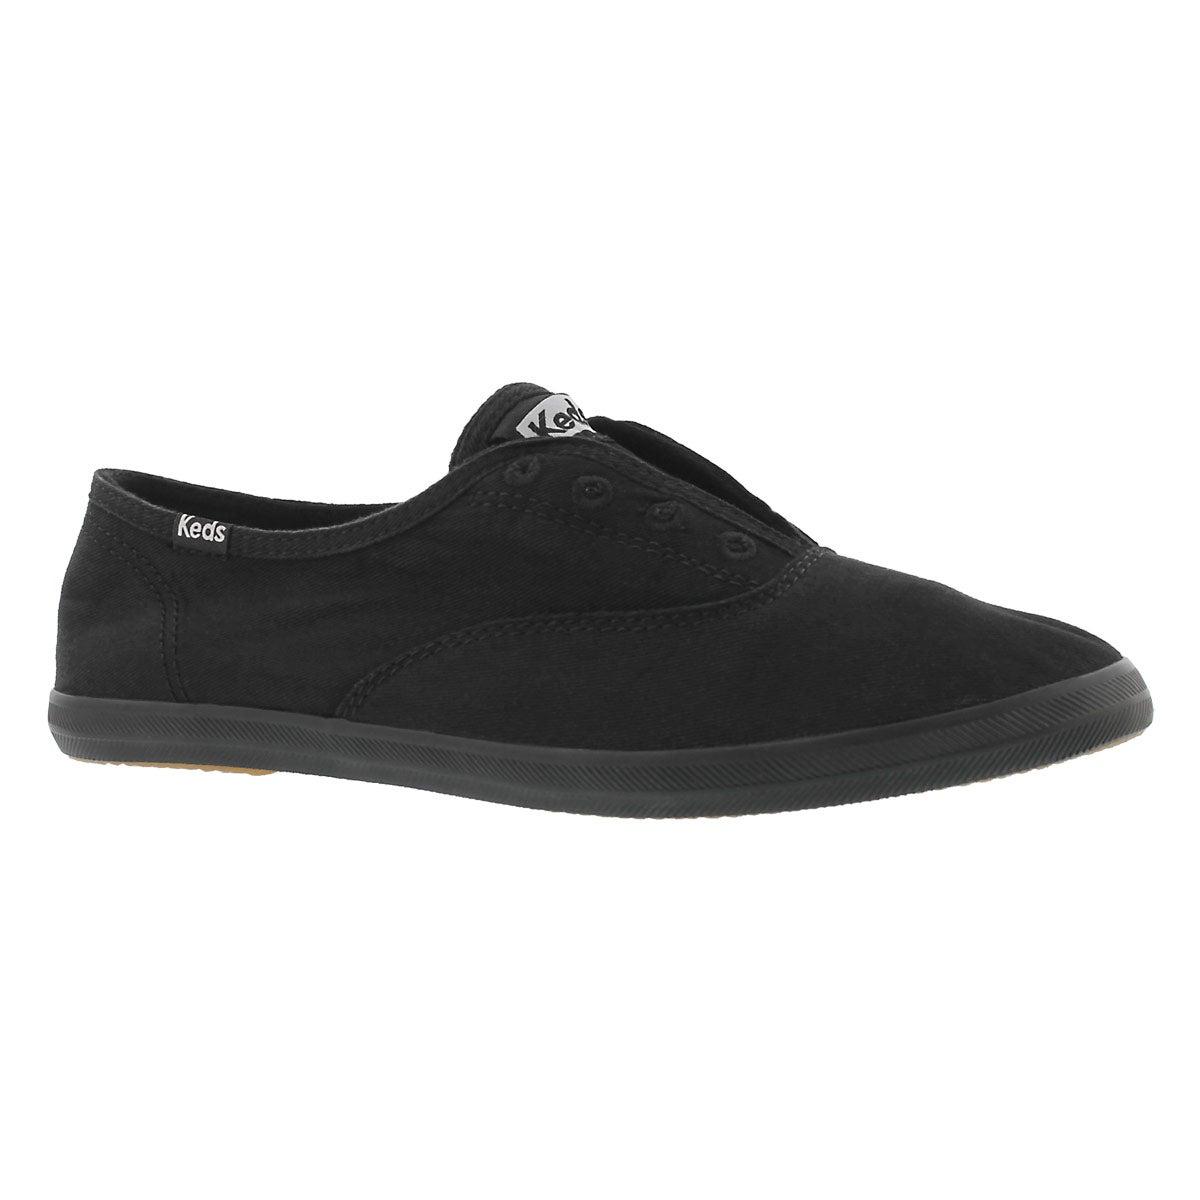 Women's CHILLAX black slip on sneakers